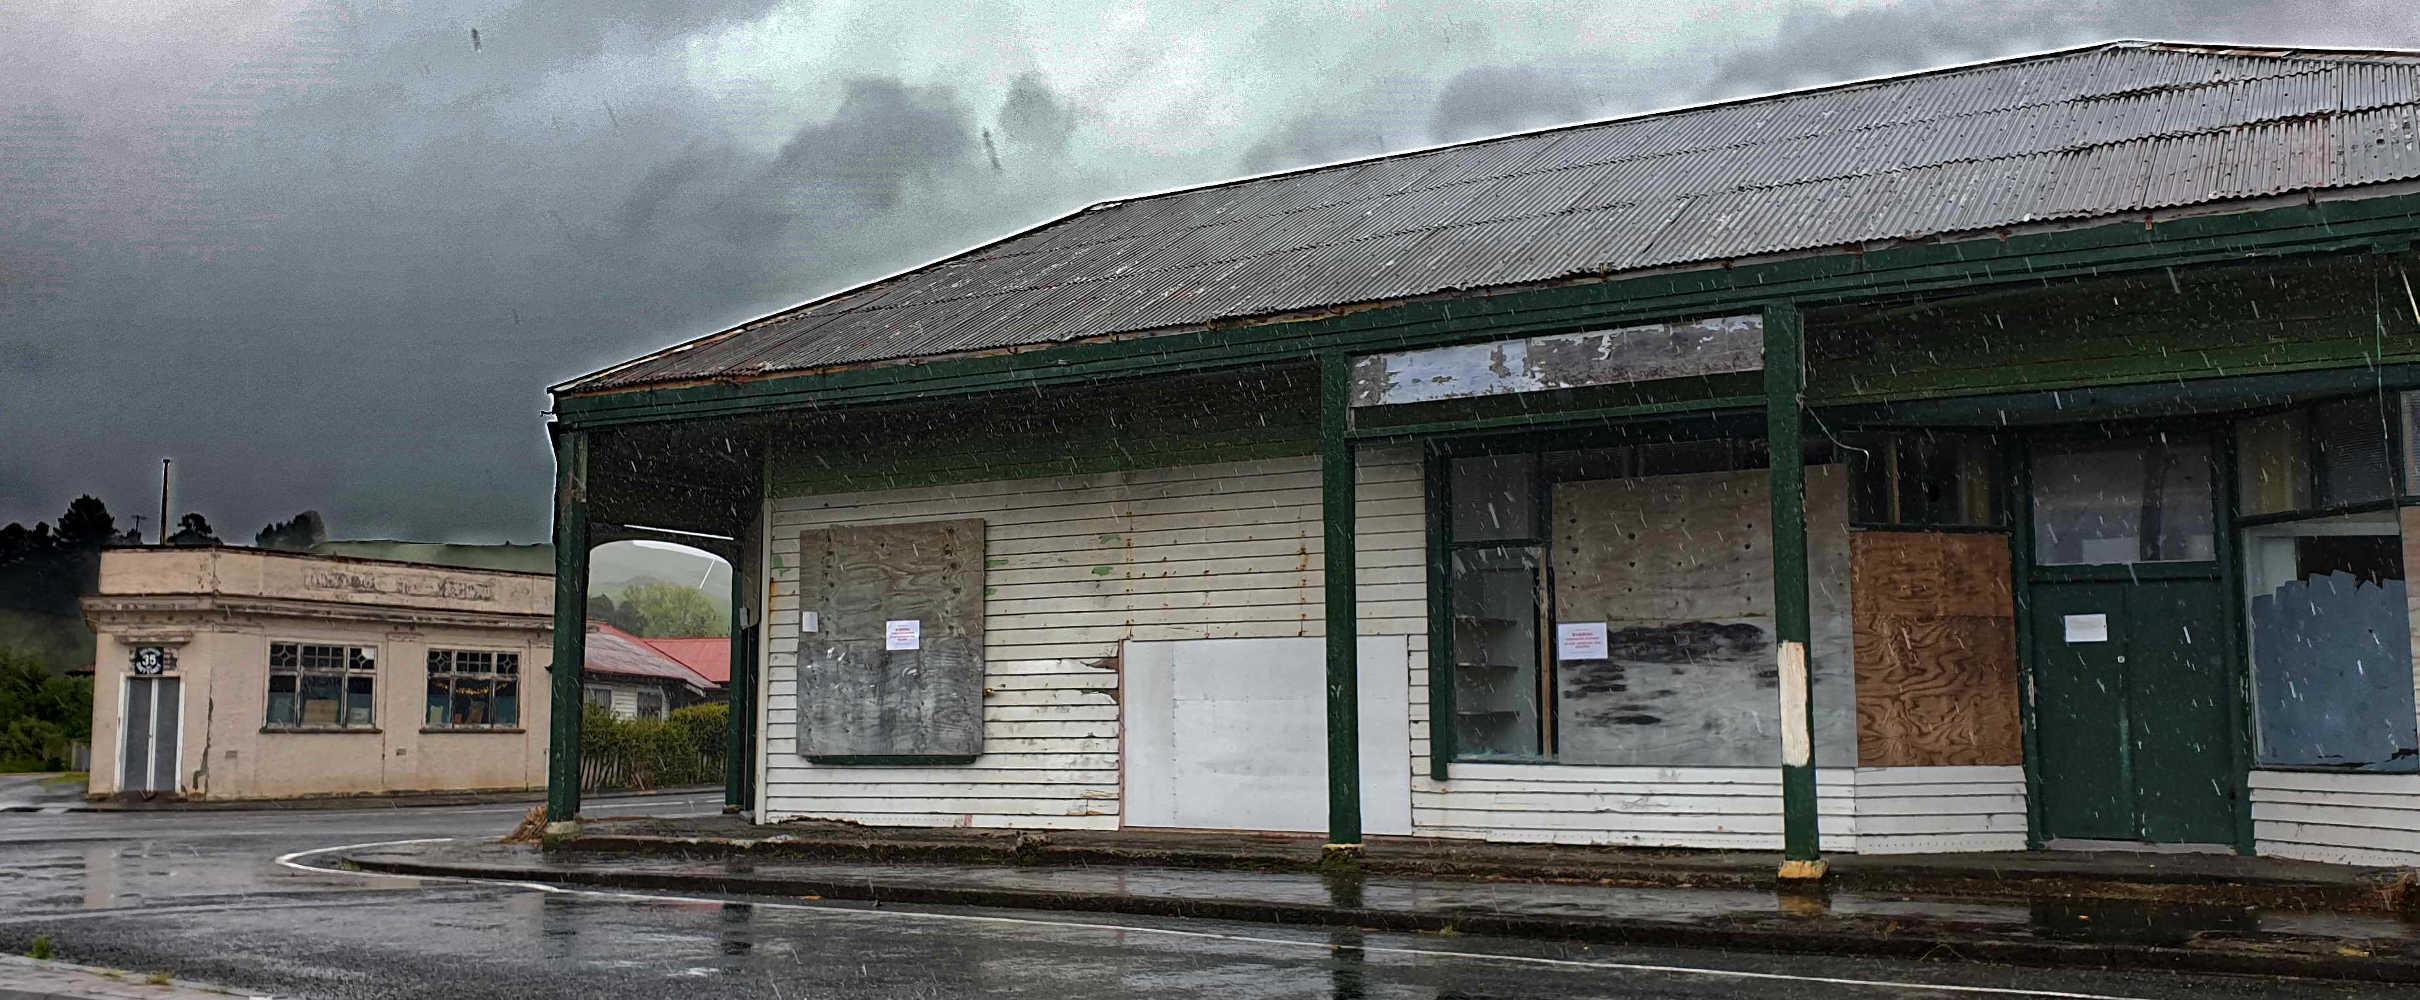 Tolaga Bay closed general store,New Zealand